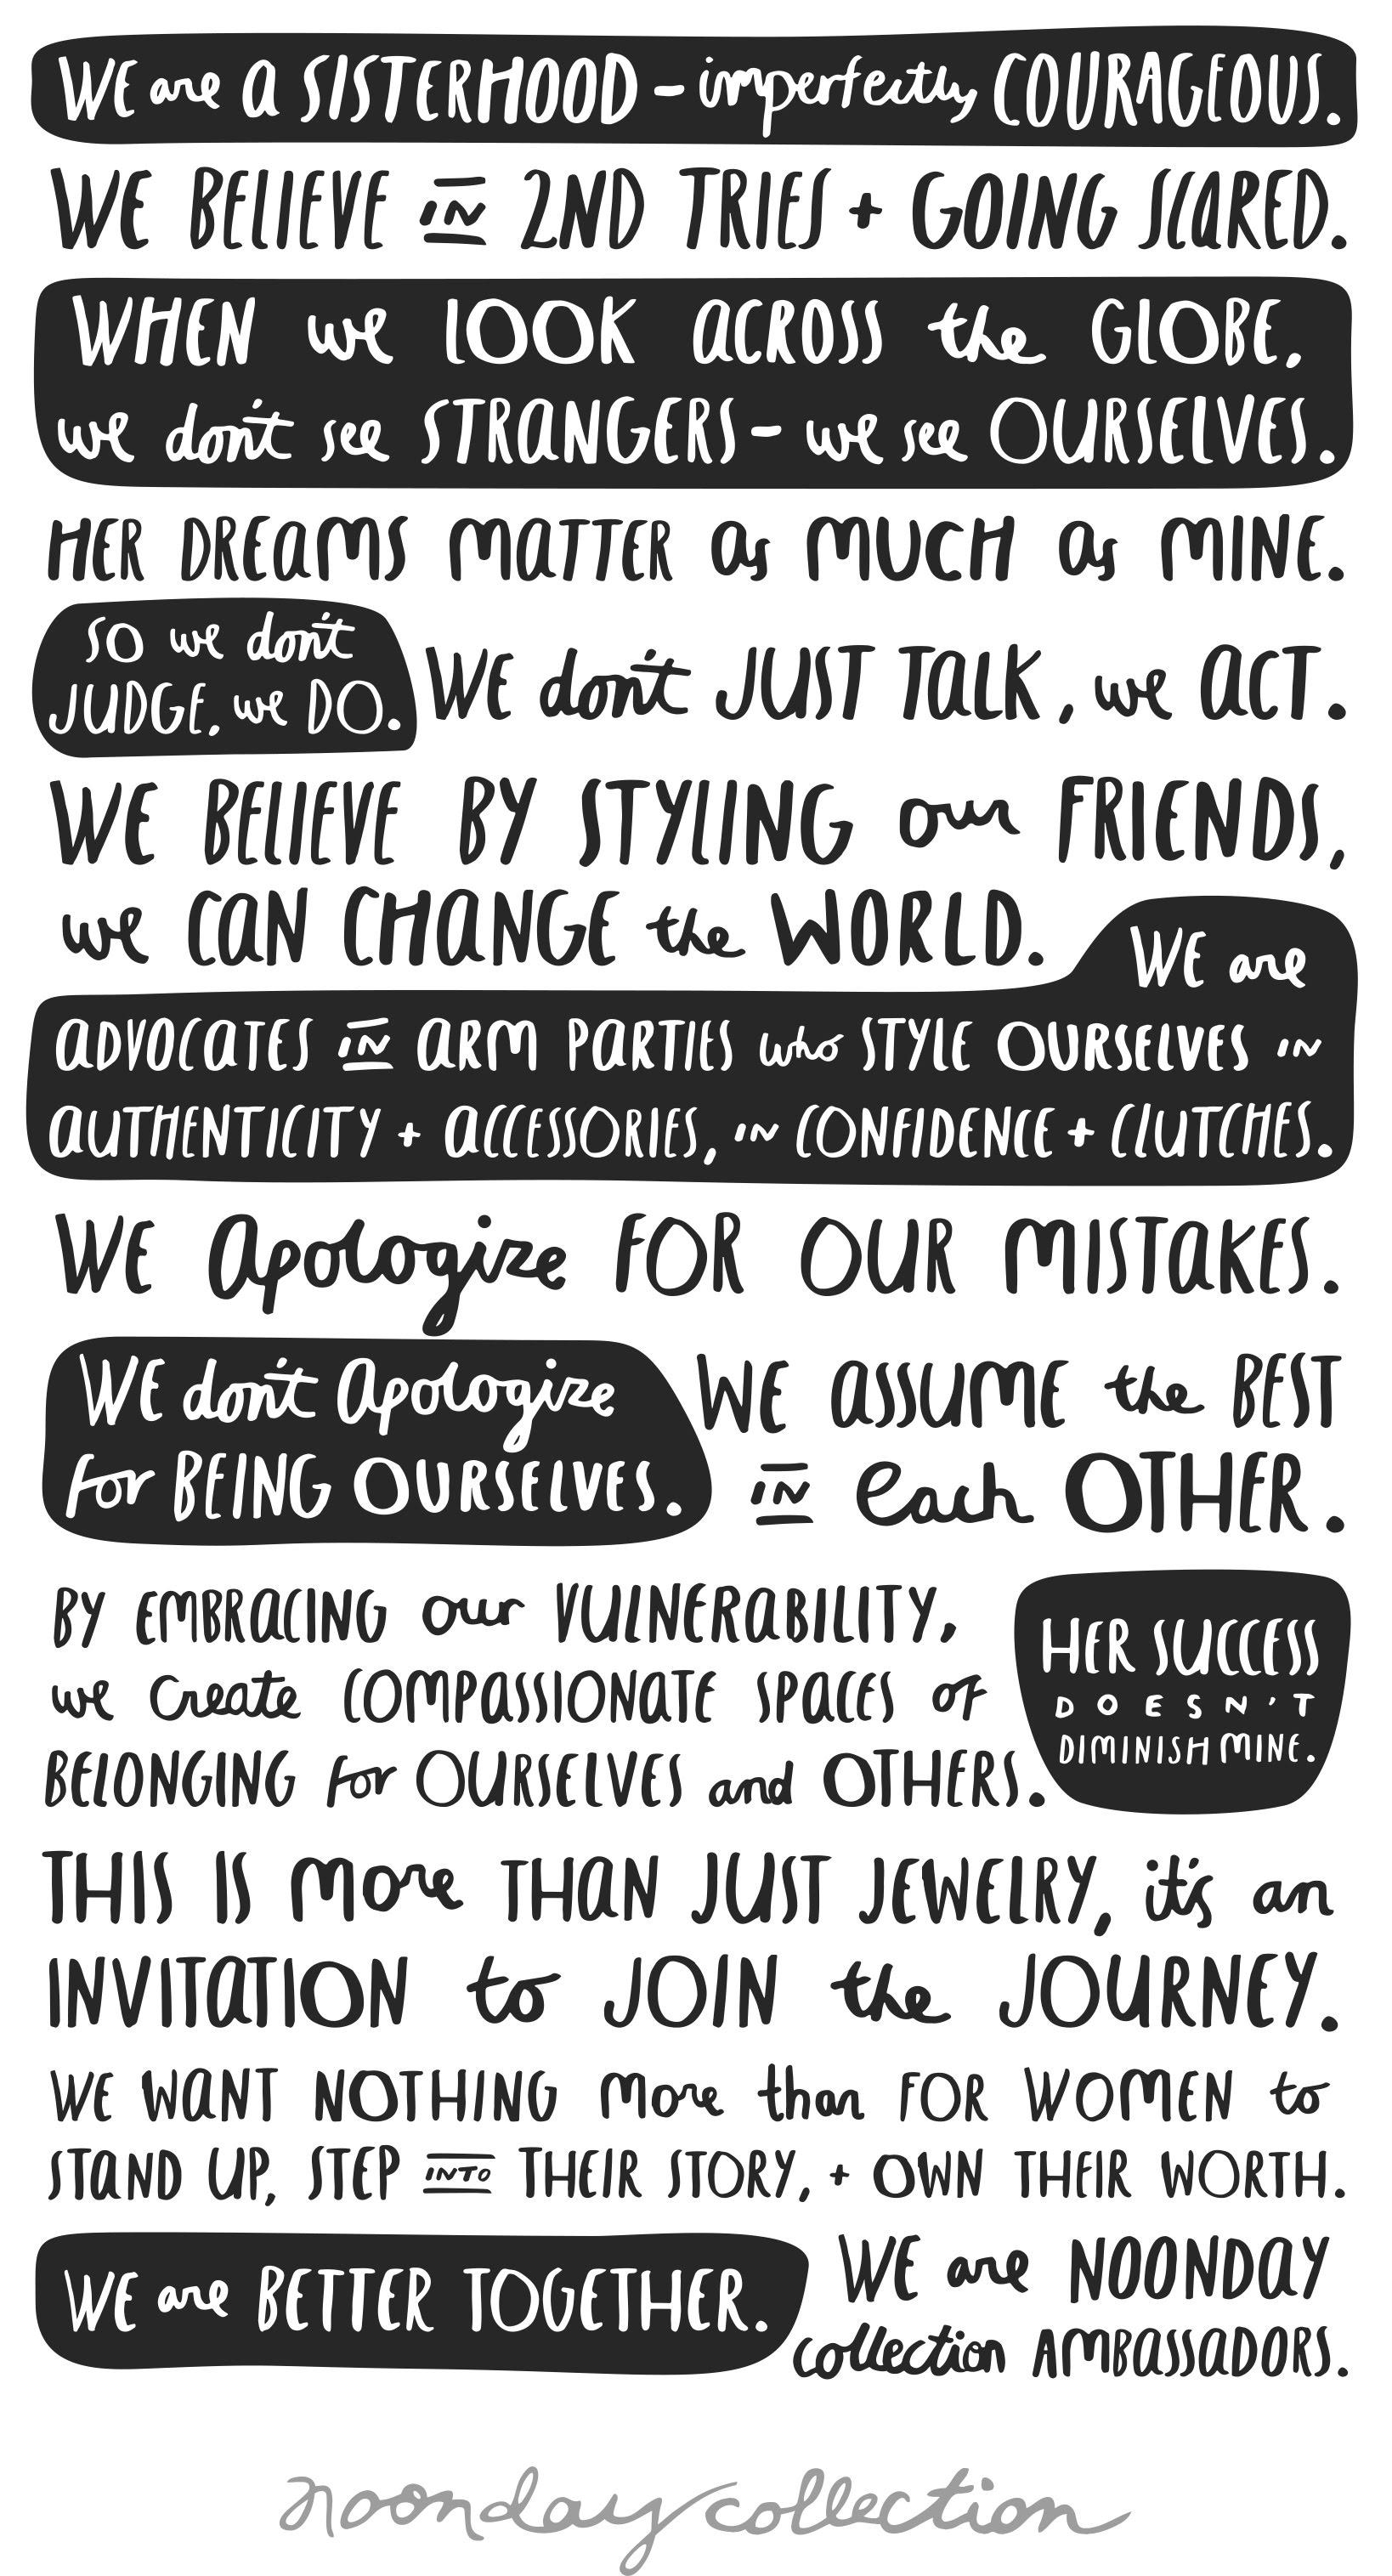 Ambassador Manifesto.jpg